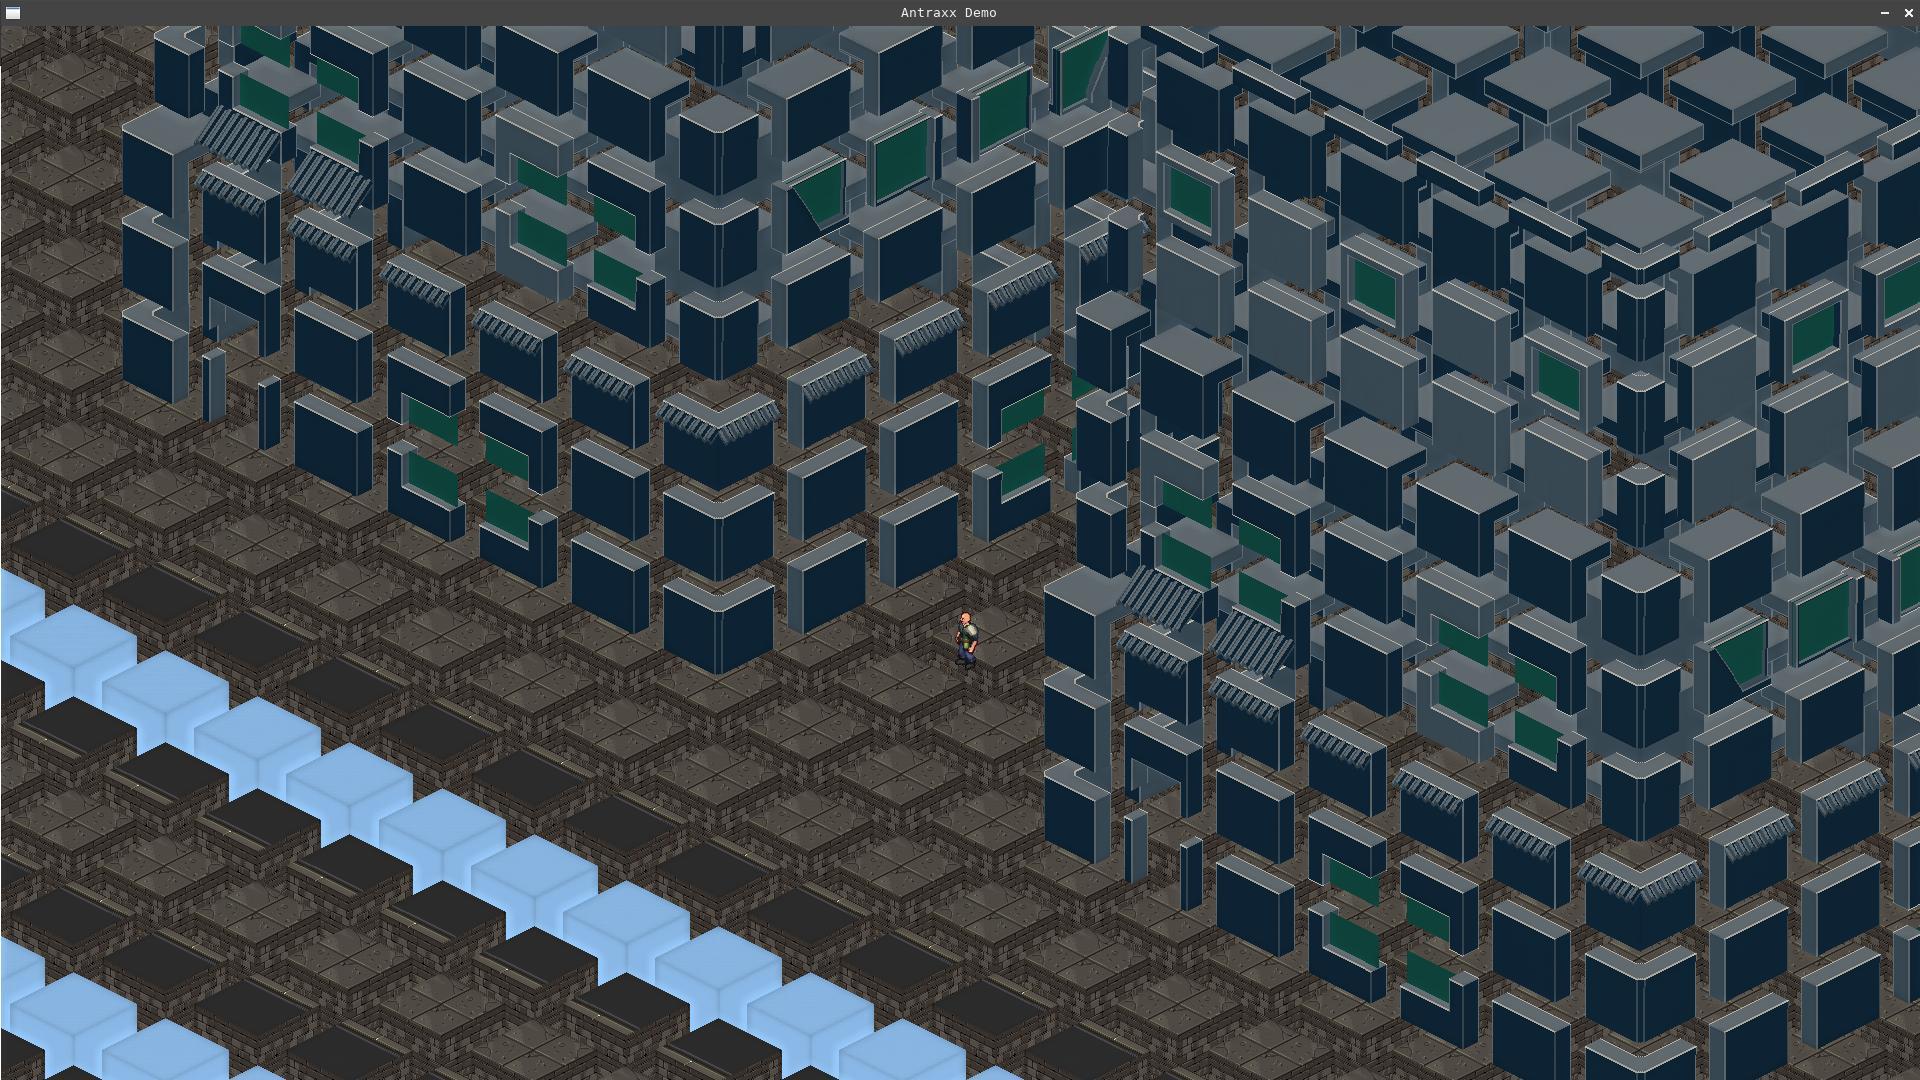 voxels to pixelart 2